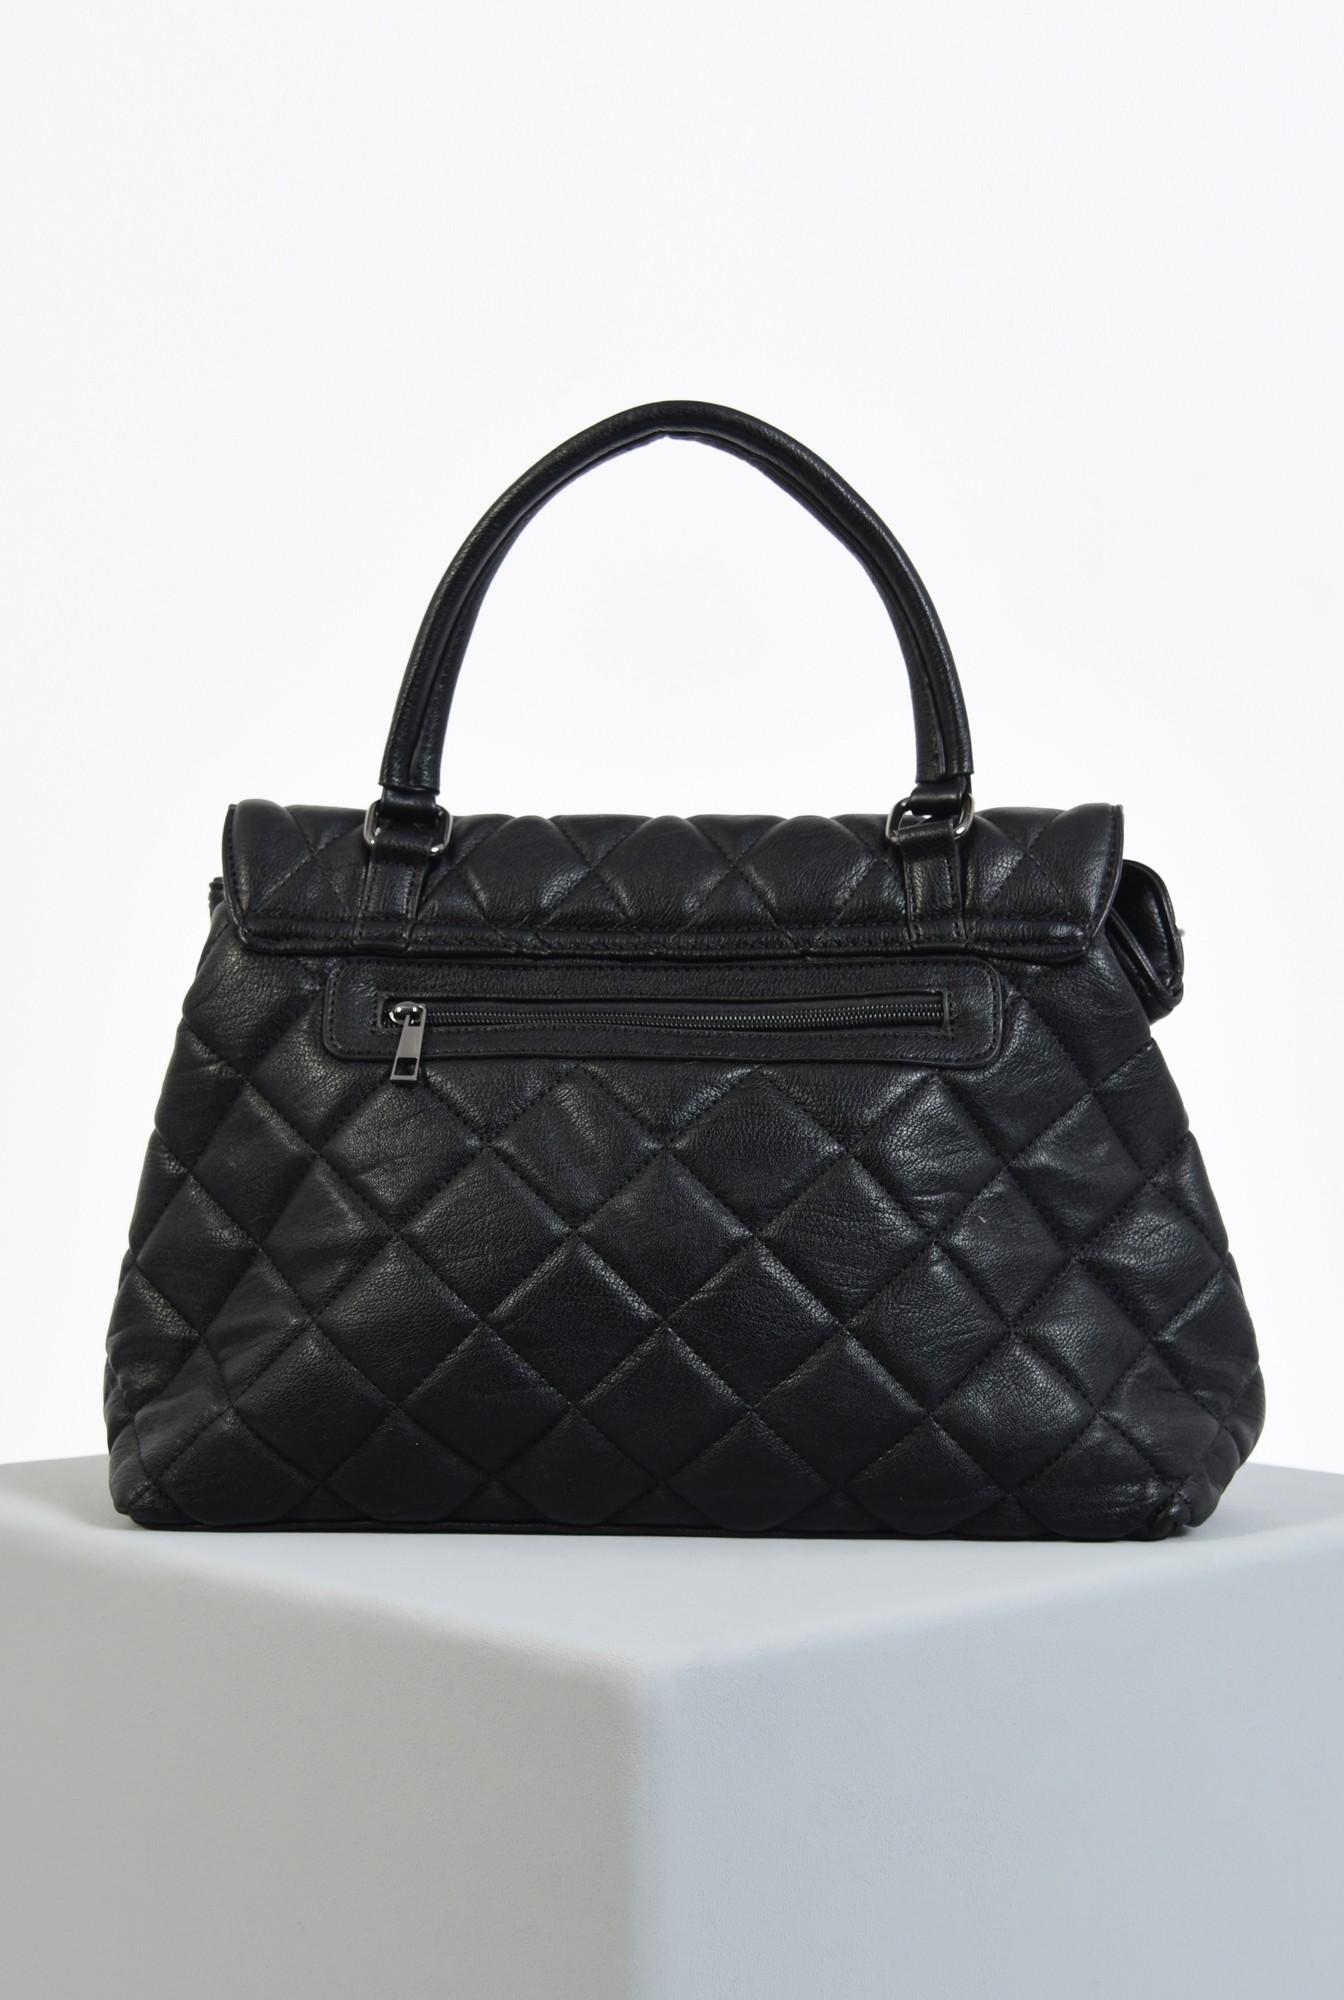 2 - geanta de mana, neagra, dimensiune mare, matlasata in V